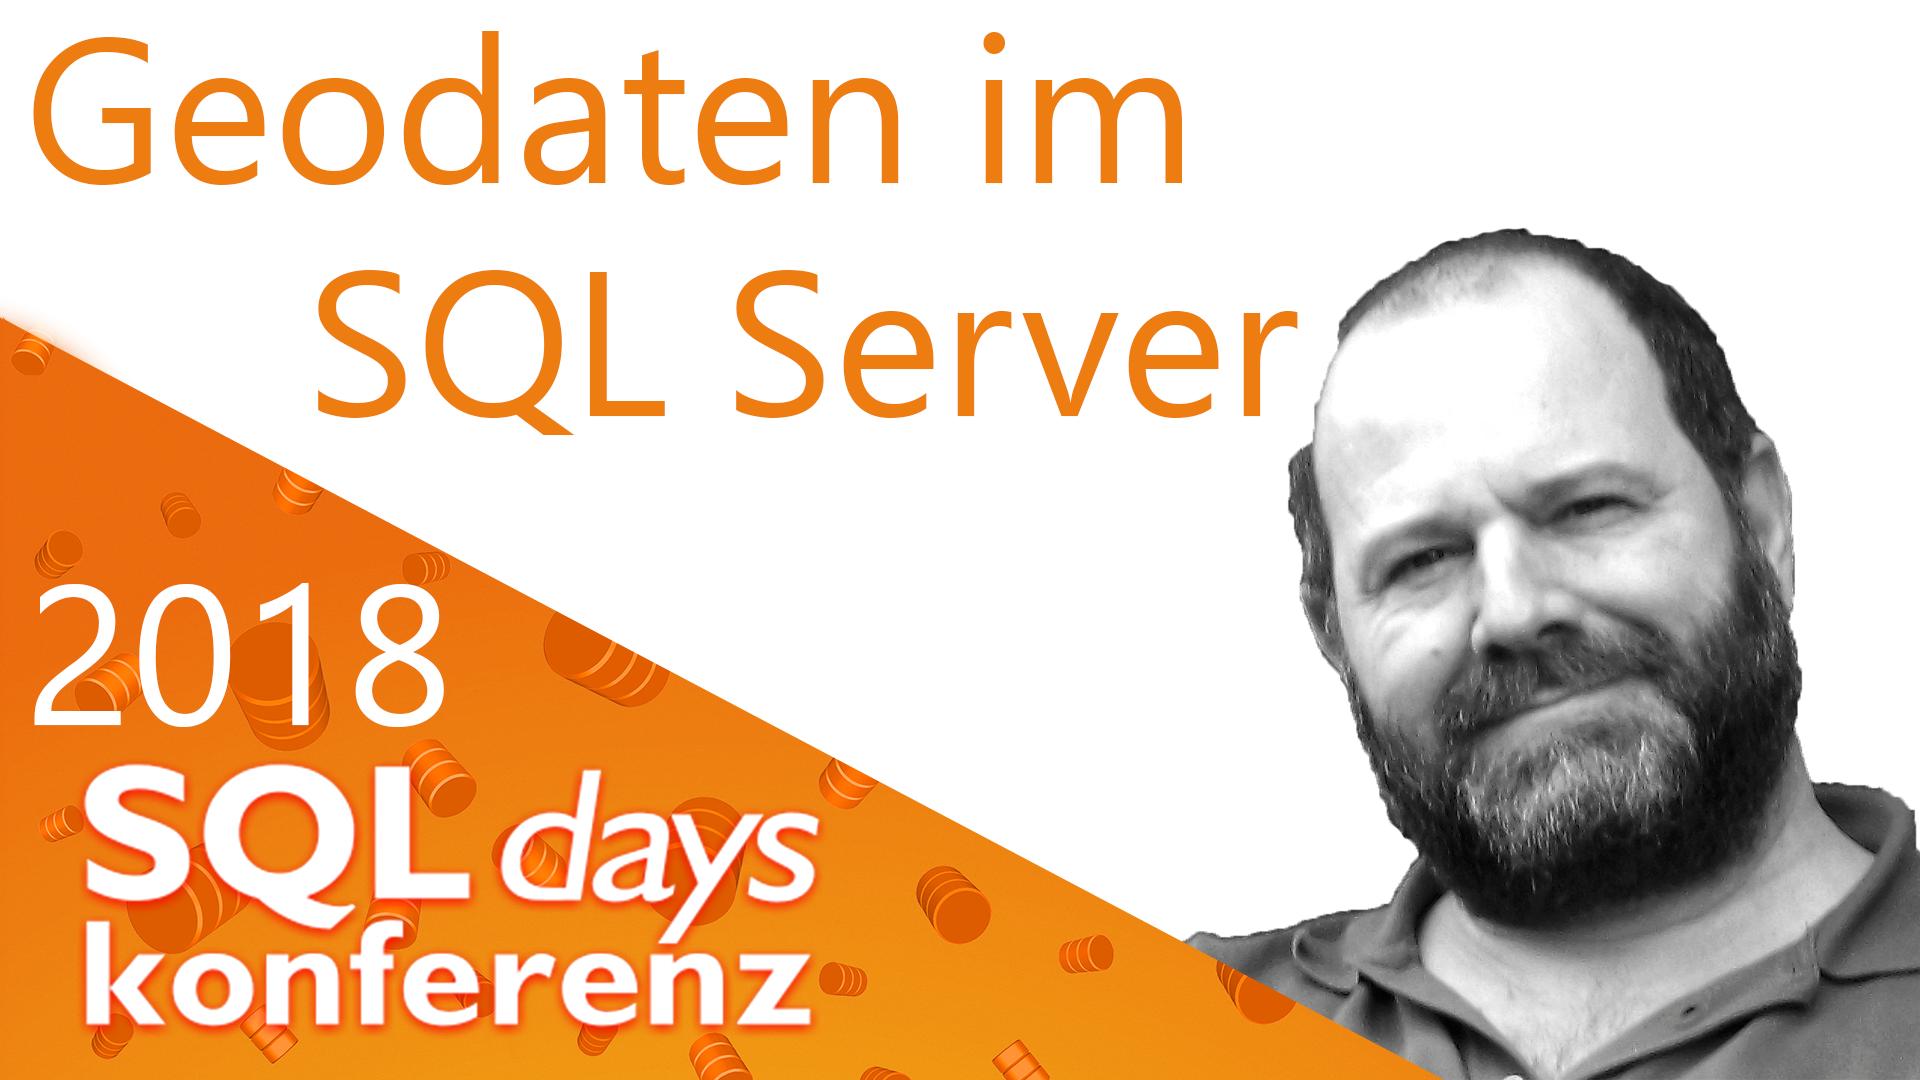 2018/SQLDays/GeodatenimSQLServer